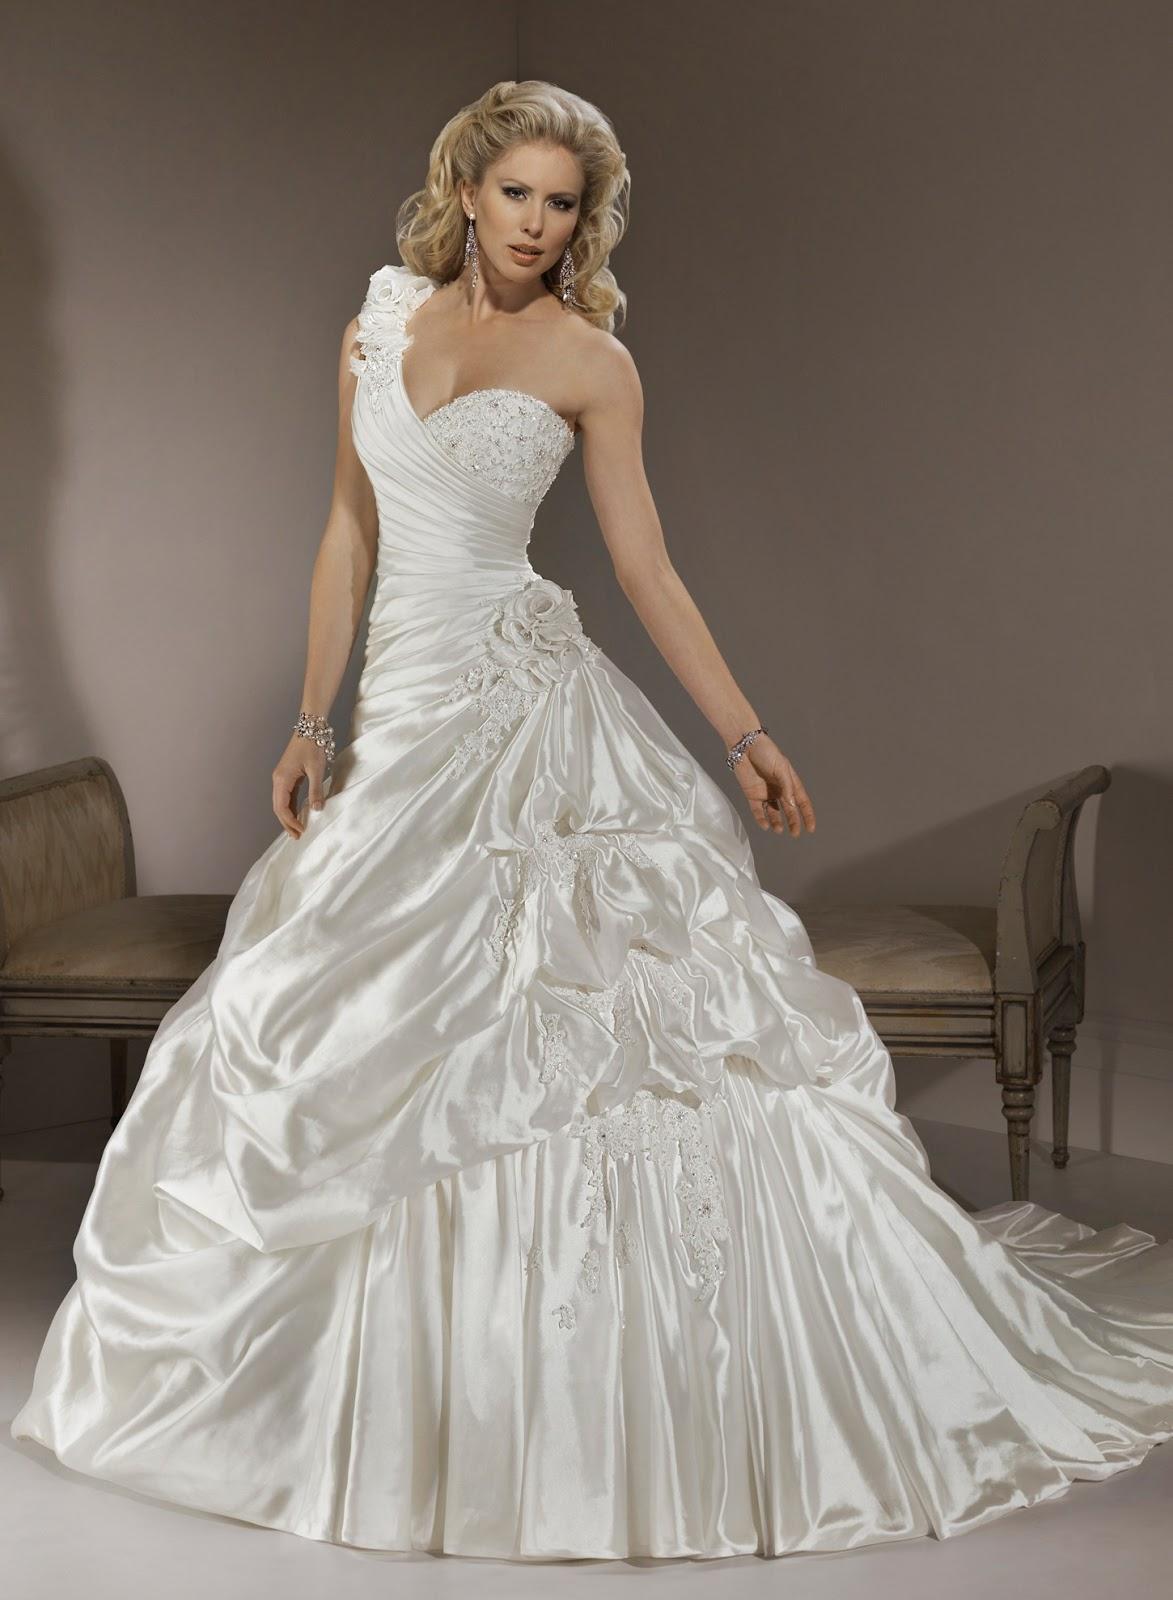 wedding litoon wedding dress. Black Bedroom Furniture Sets. Home Design Ideas